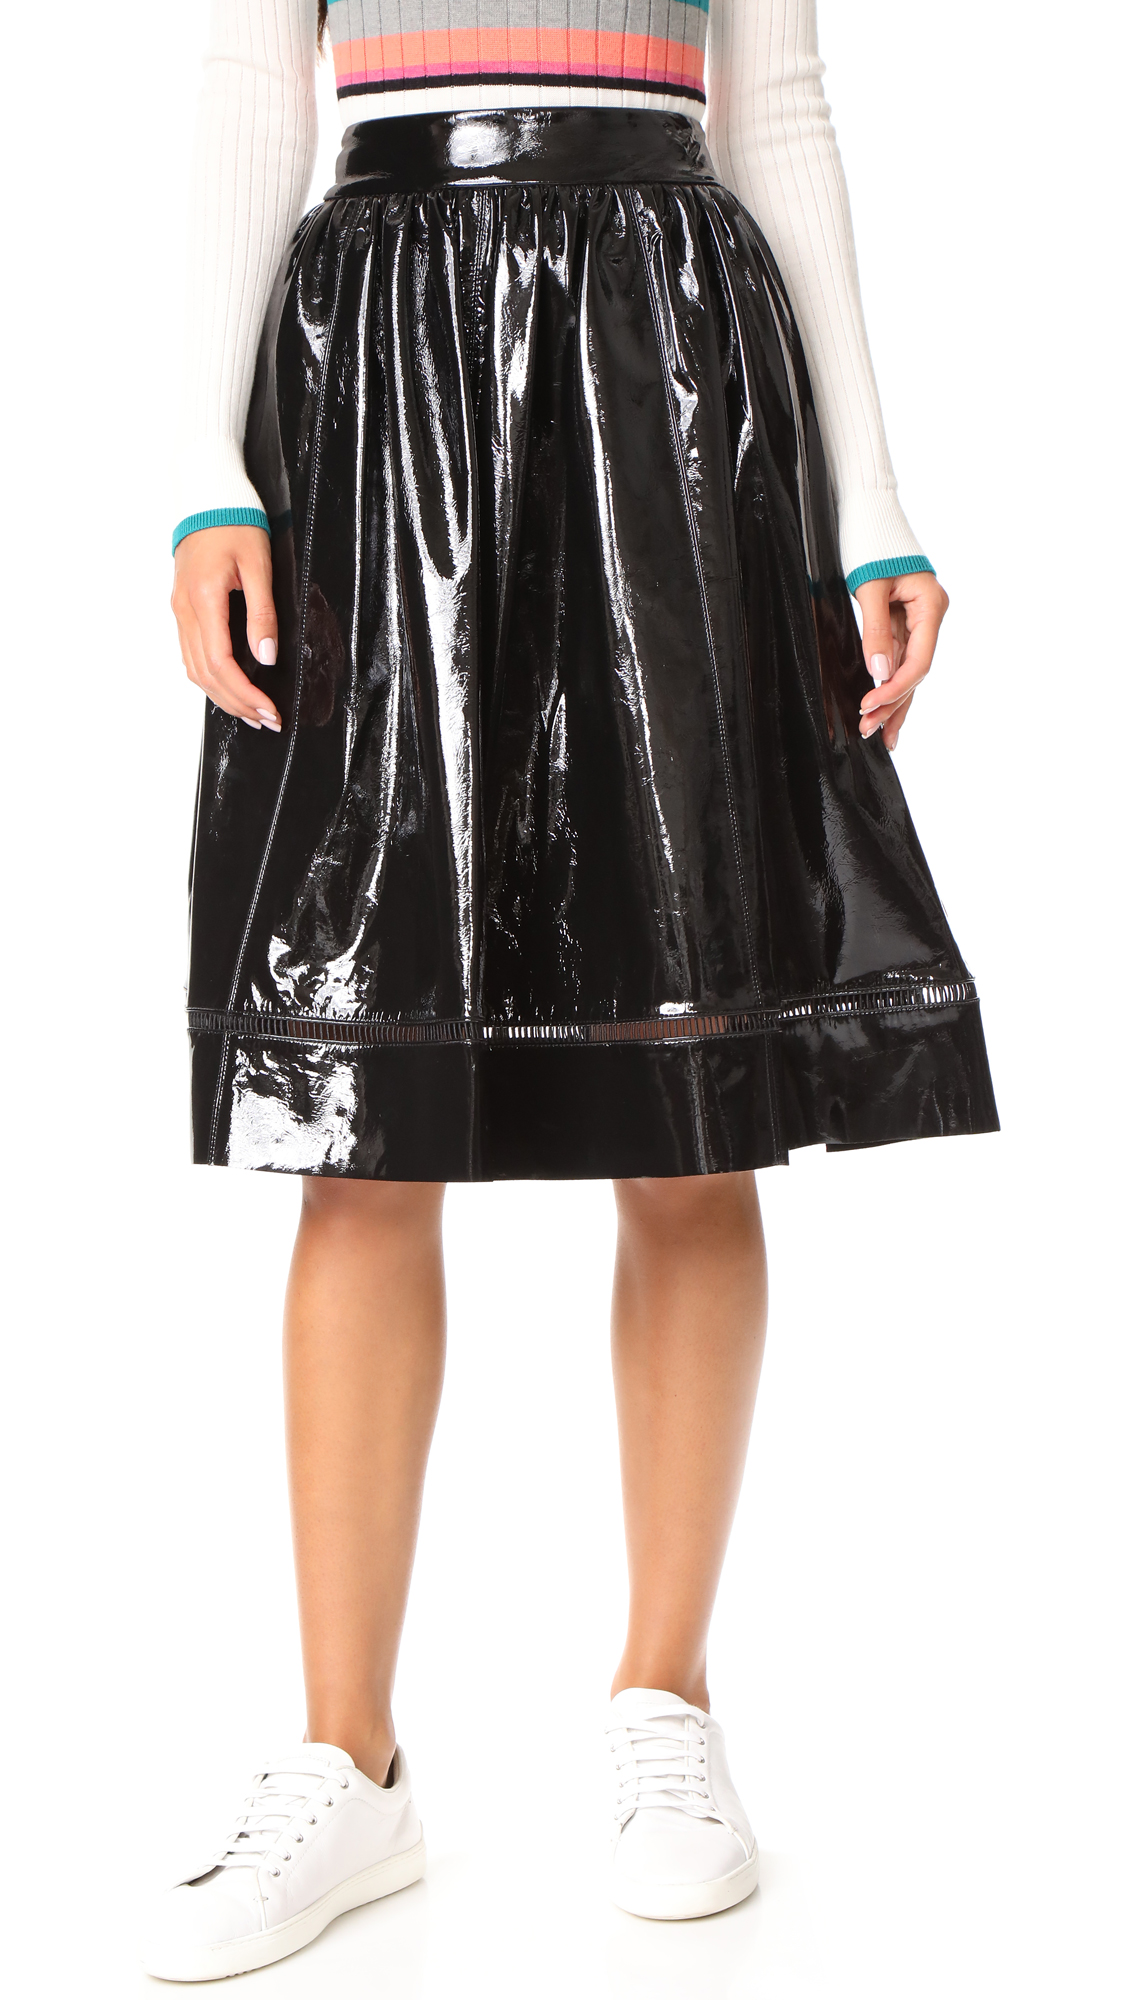 alice + olivia Misty Patent Leather Skirt - Black